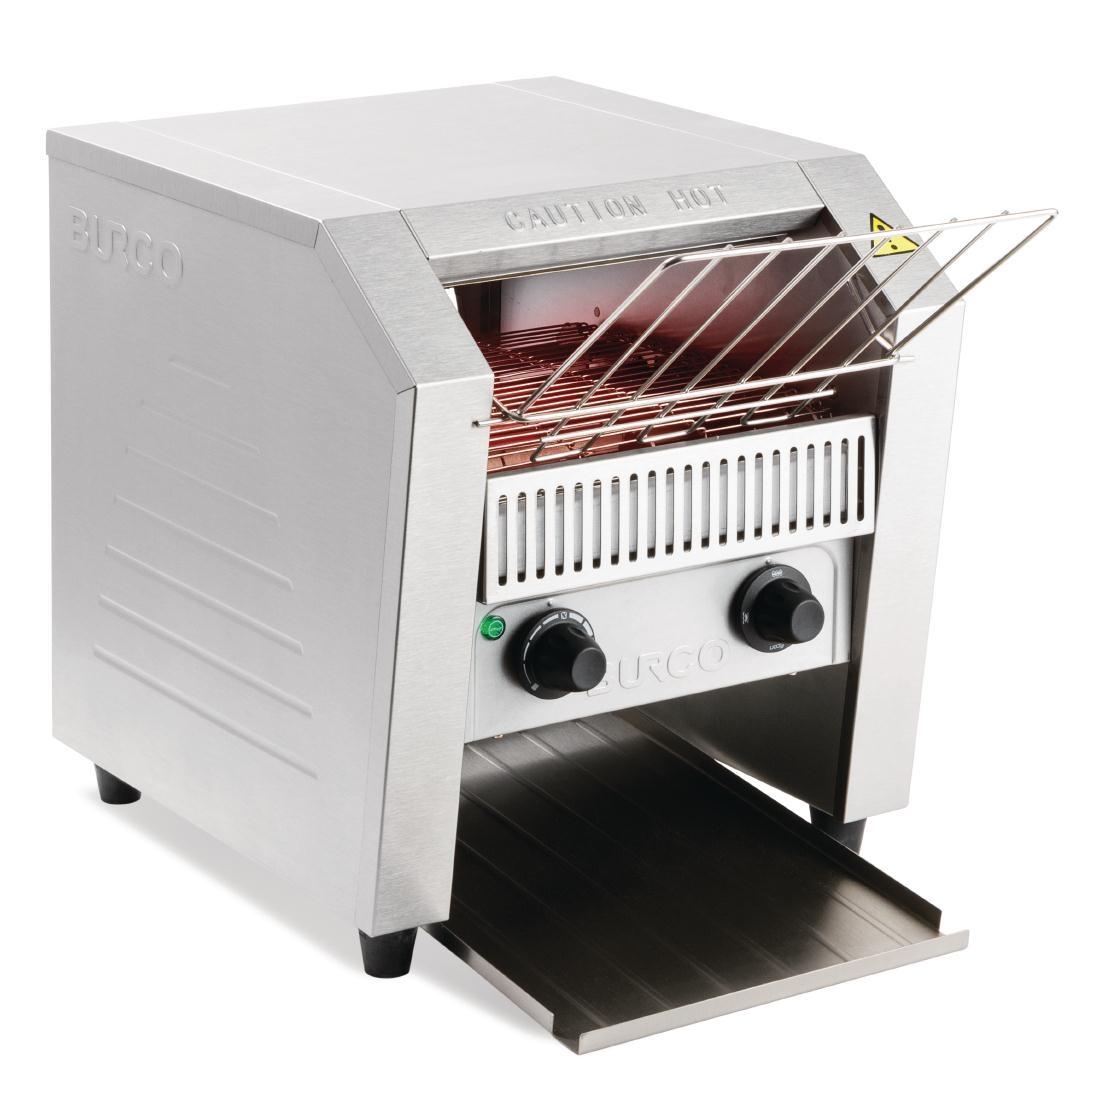 Gloucester Event Hire - Conveyor Toaster. 2.6kW